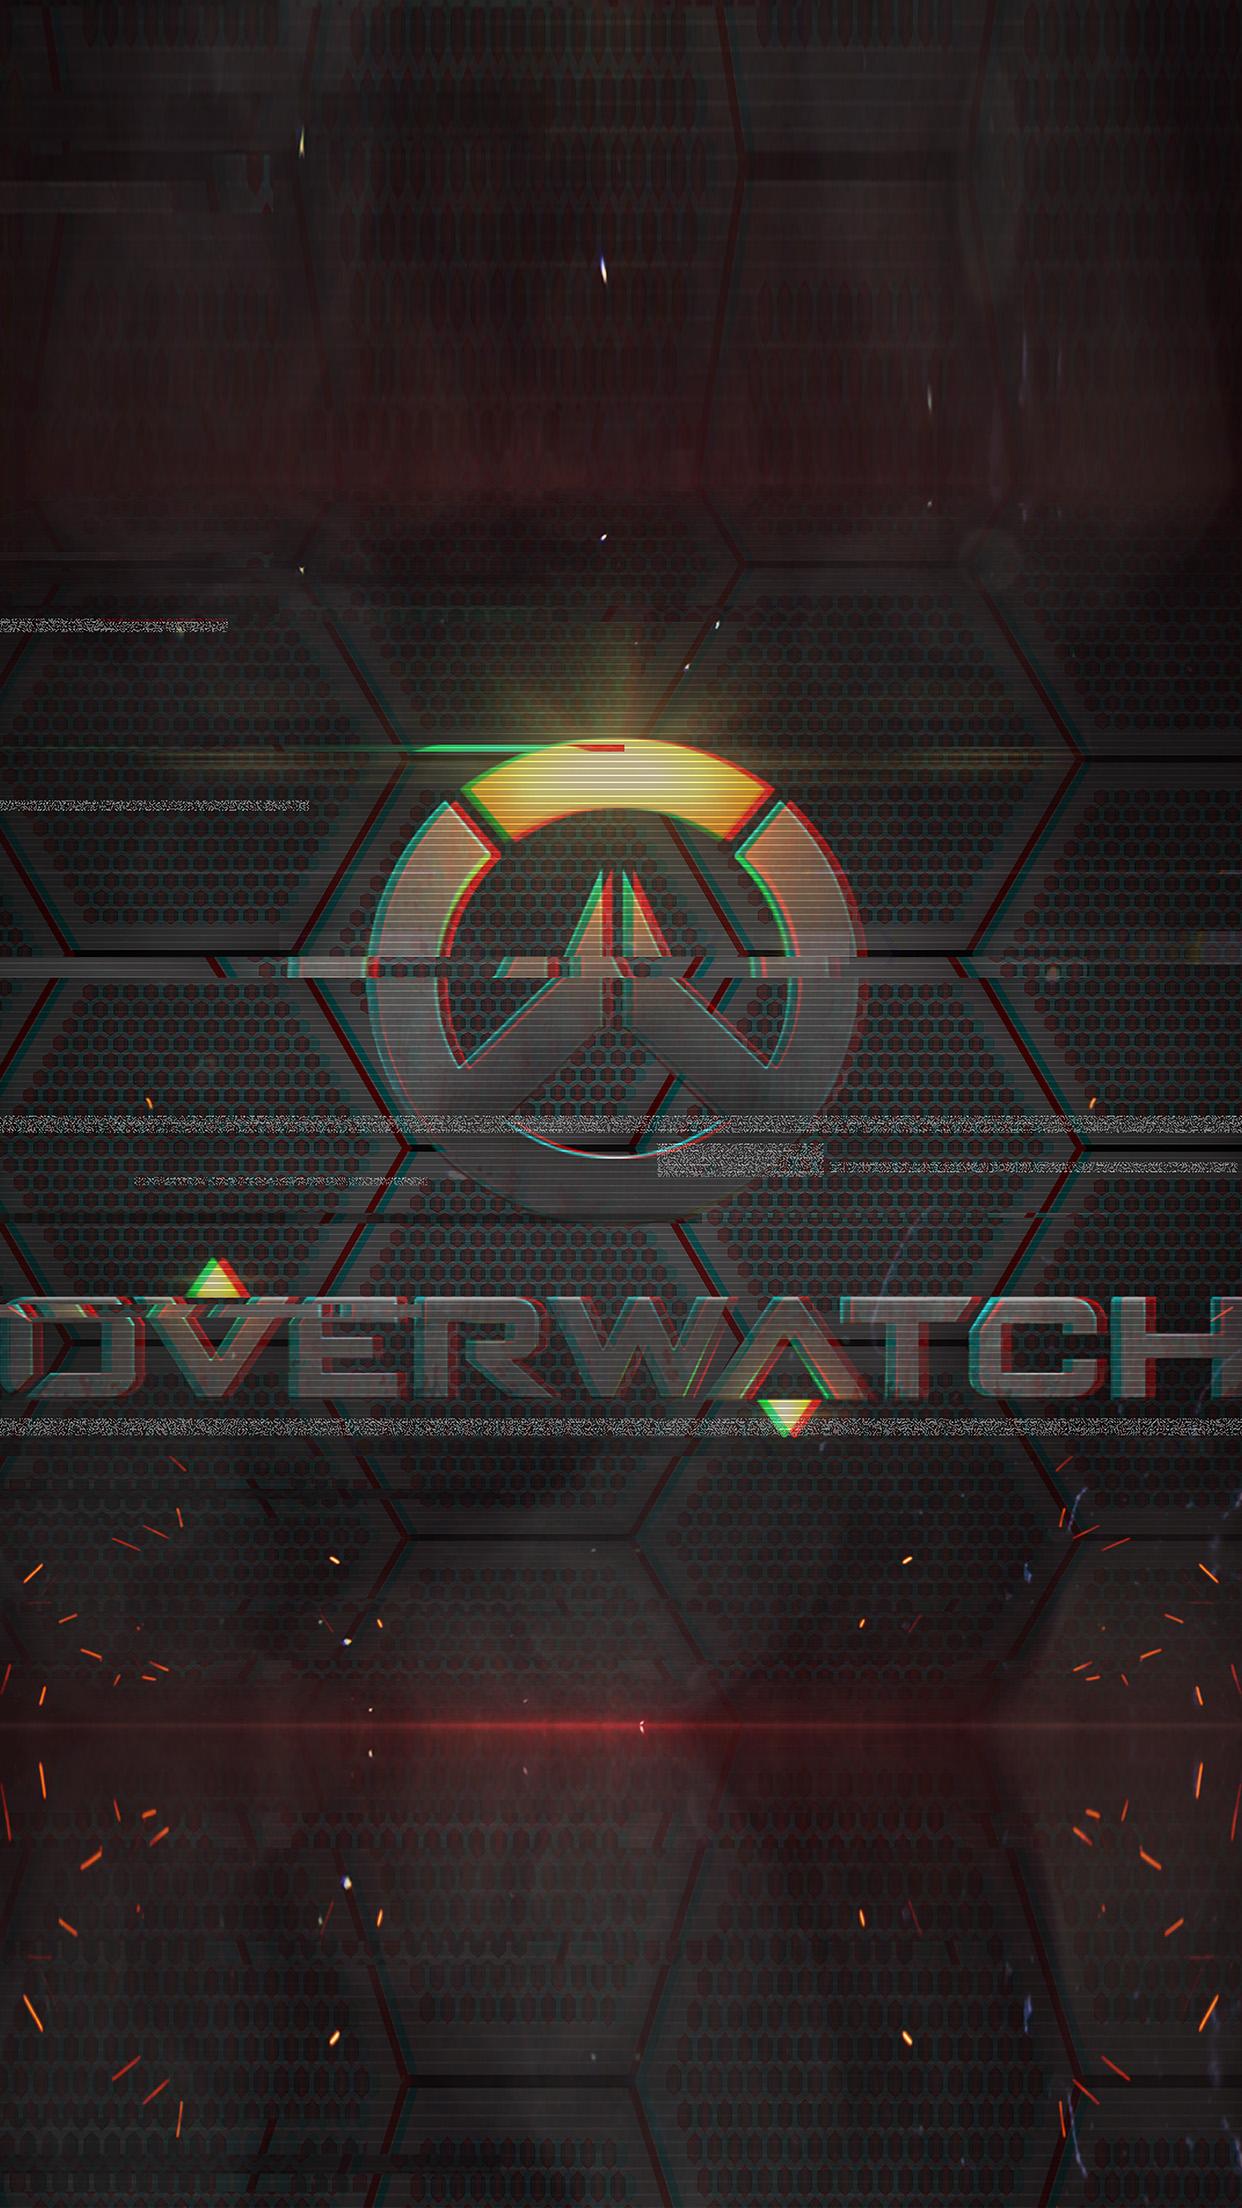 As13 Overwatch Logo Game Art Illustration Wallpaper